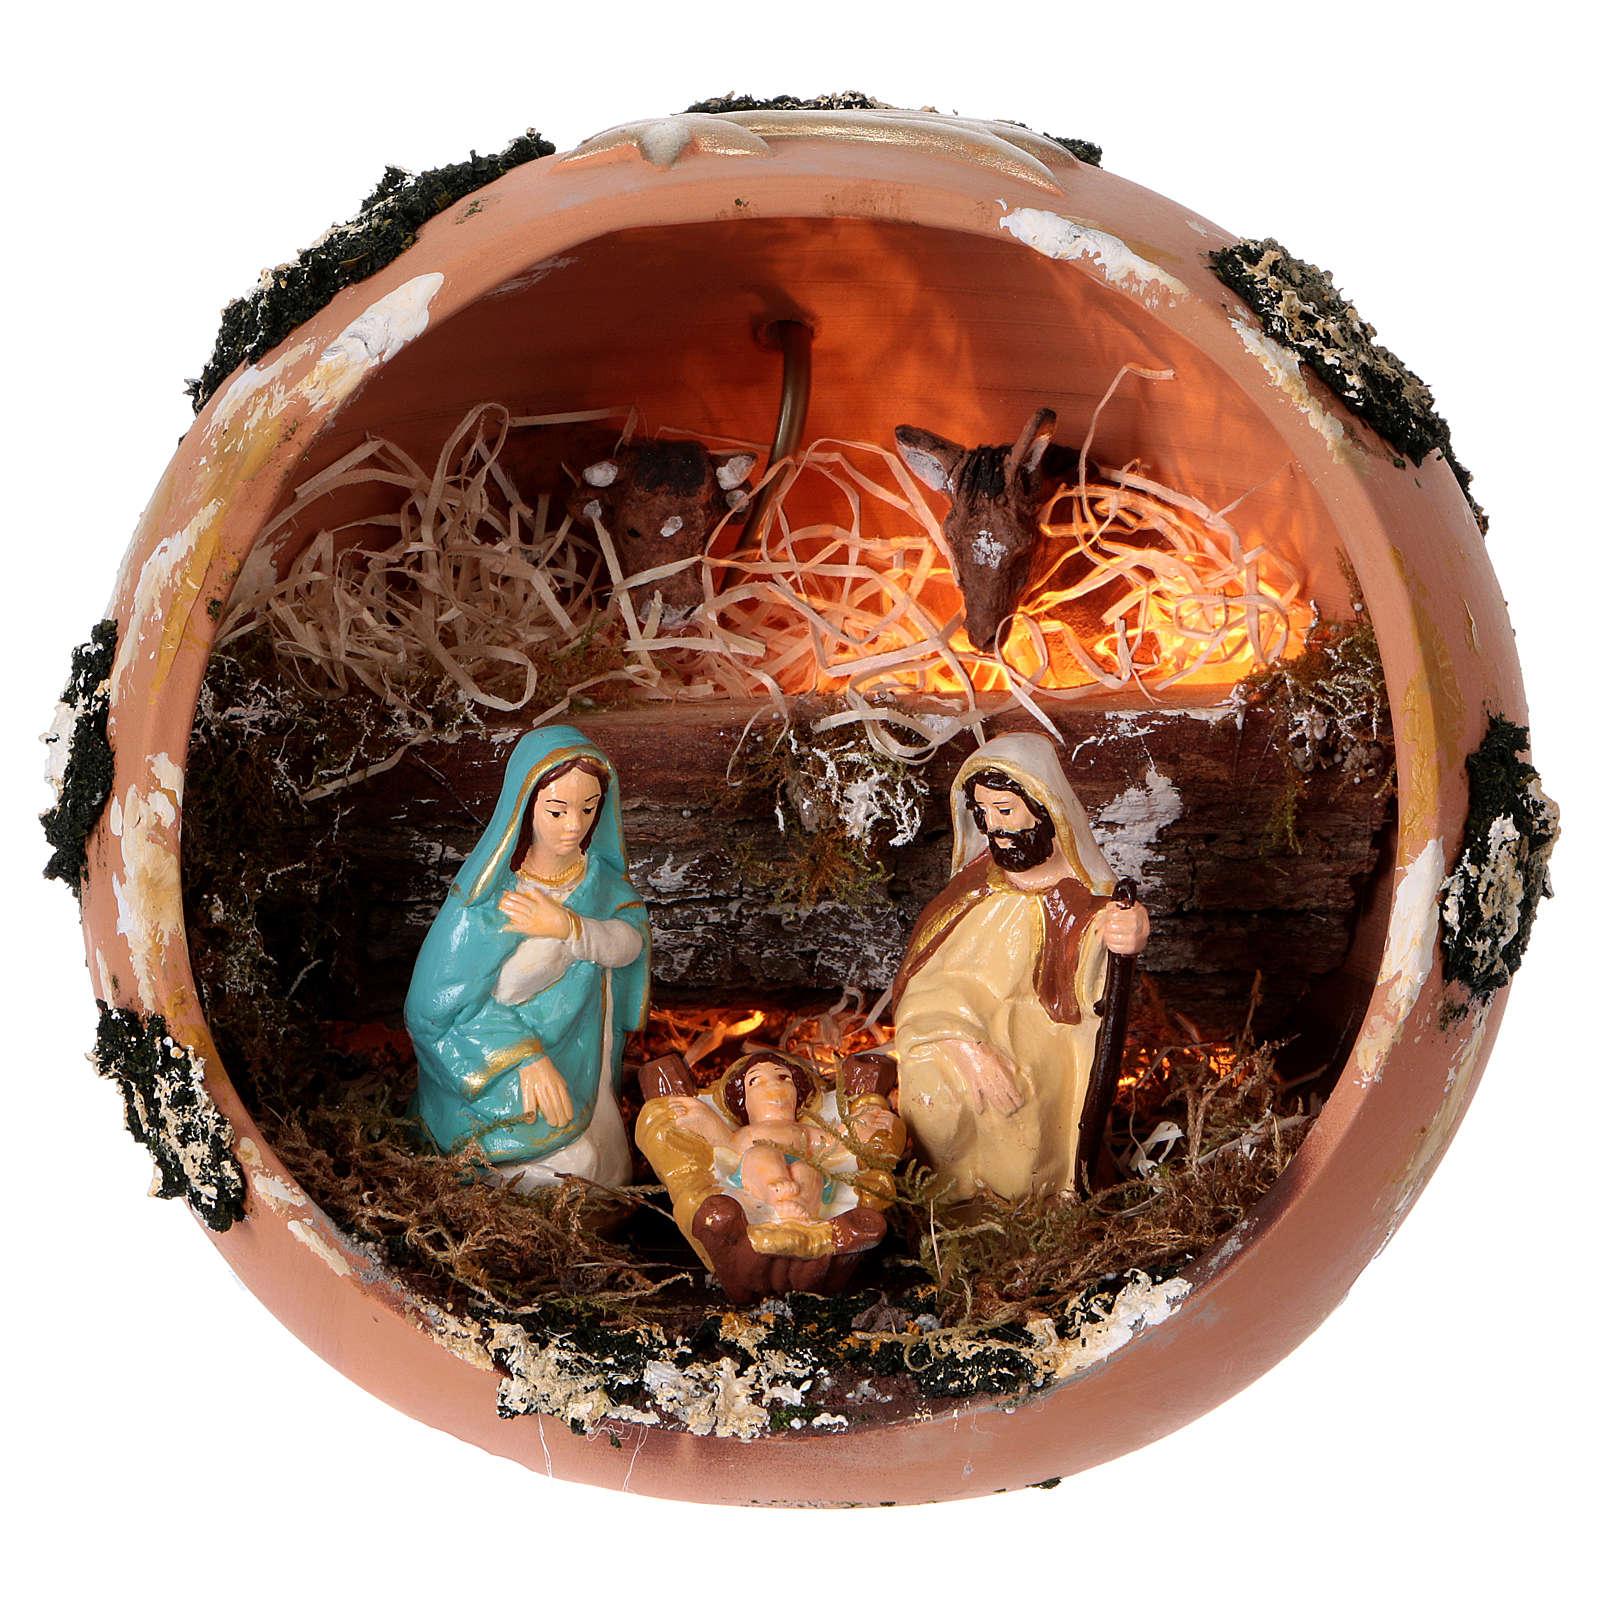 Bola belén con luz de terracota Deruta 5 piezas 4